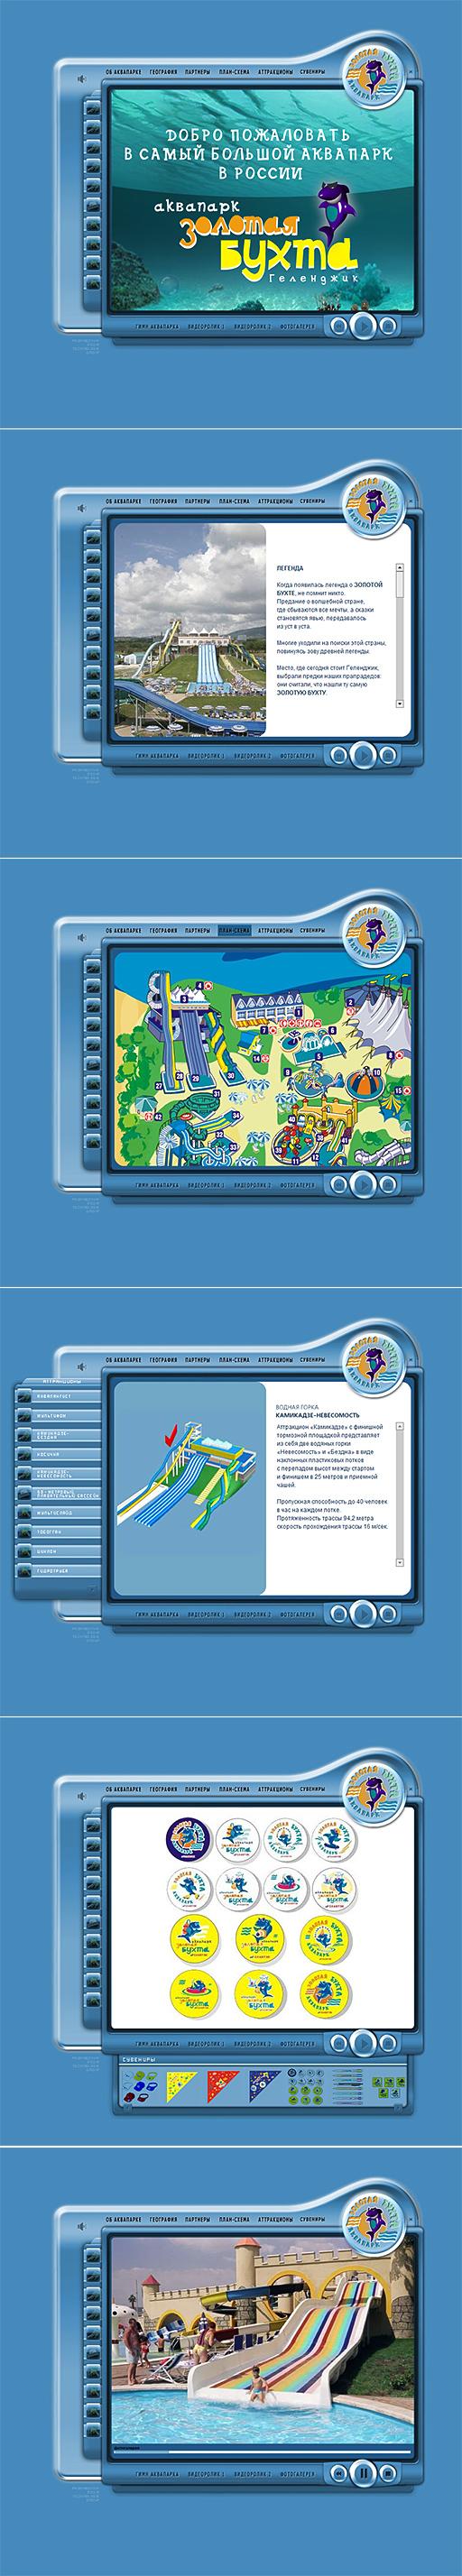 2005 - «Золотая Бухта» - мультимедийная презентация аквапарка в Геленджике